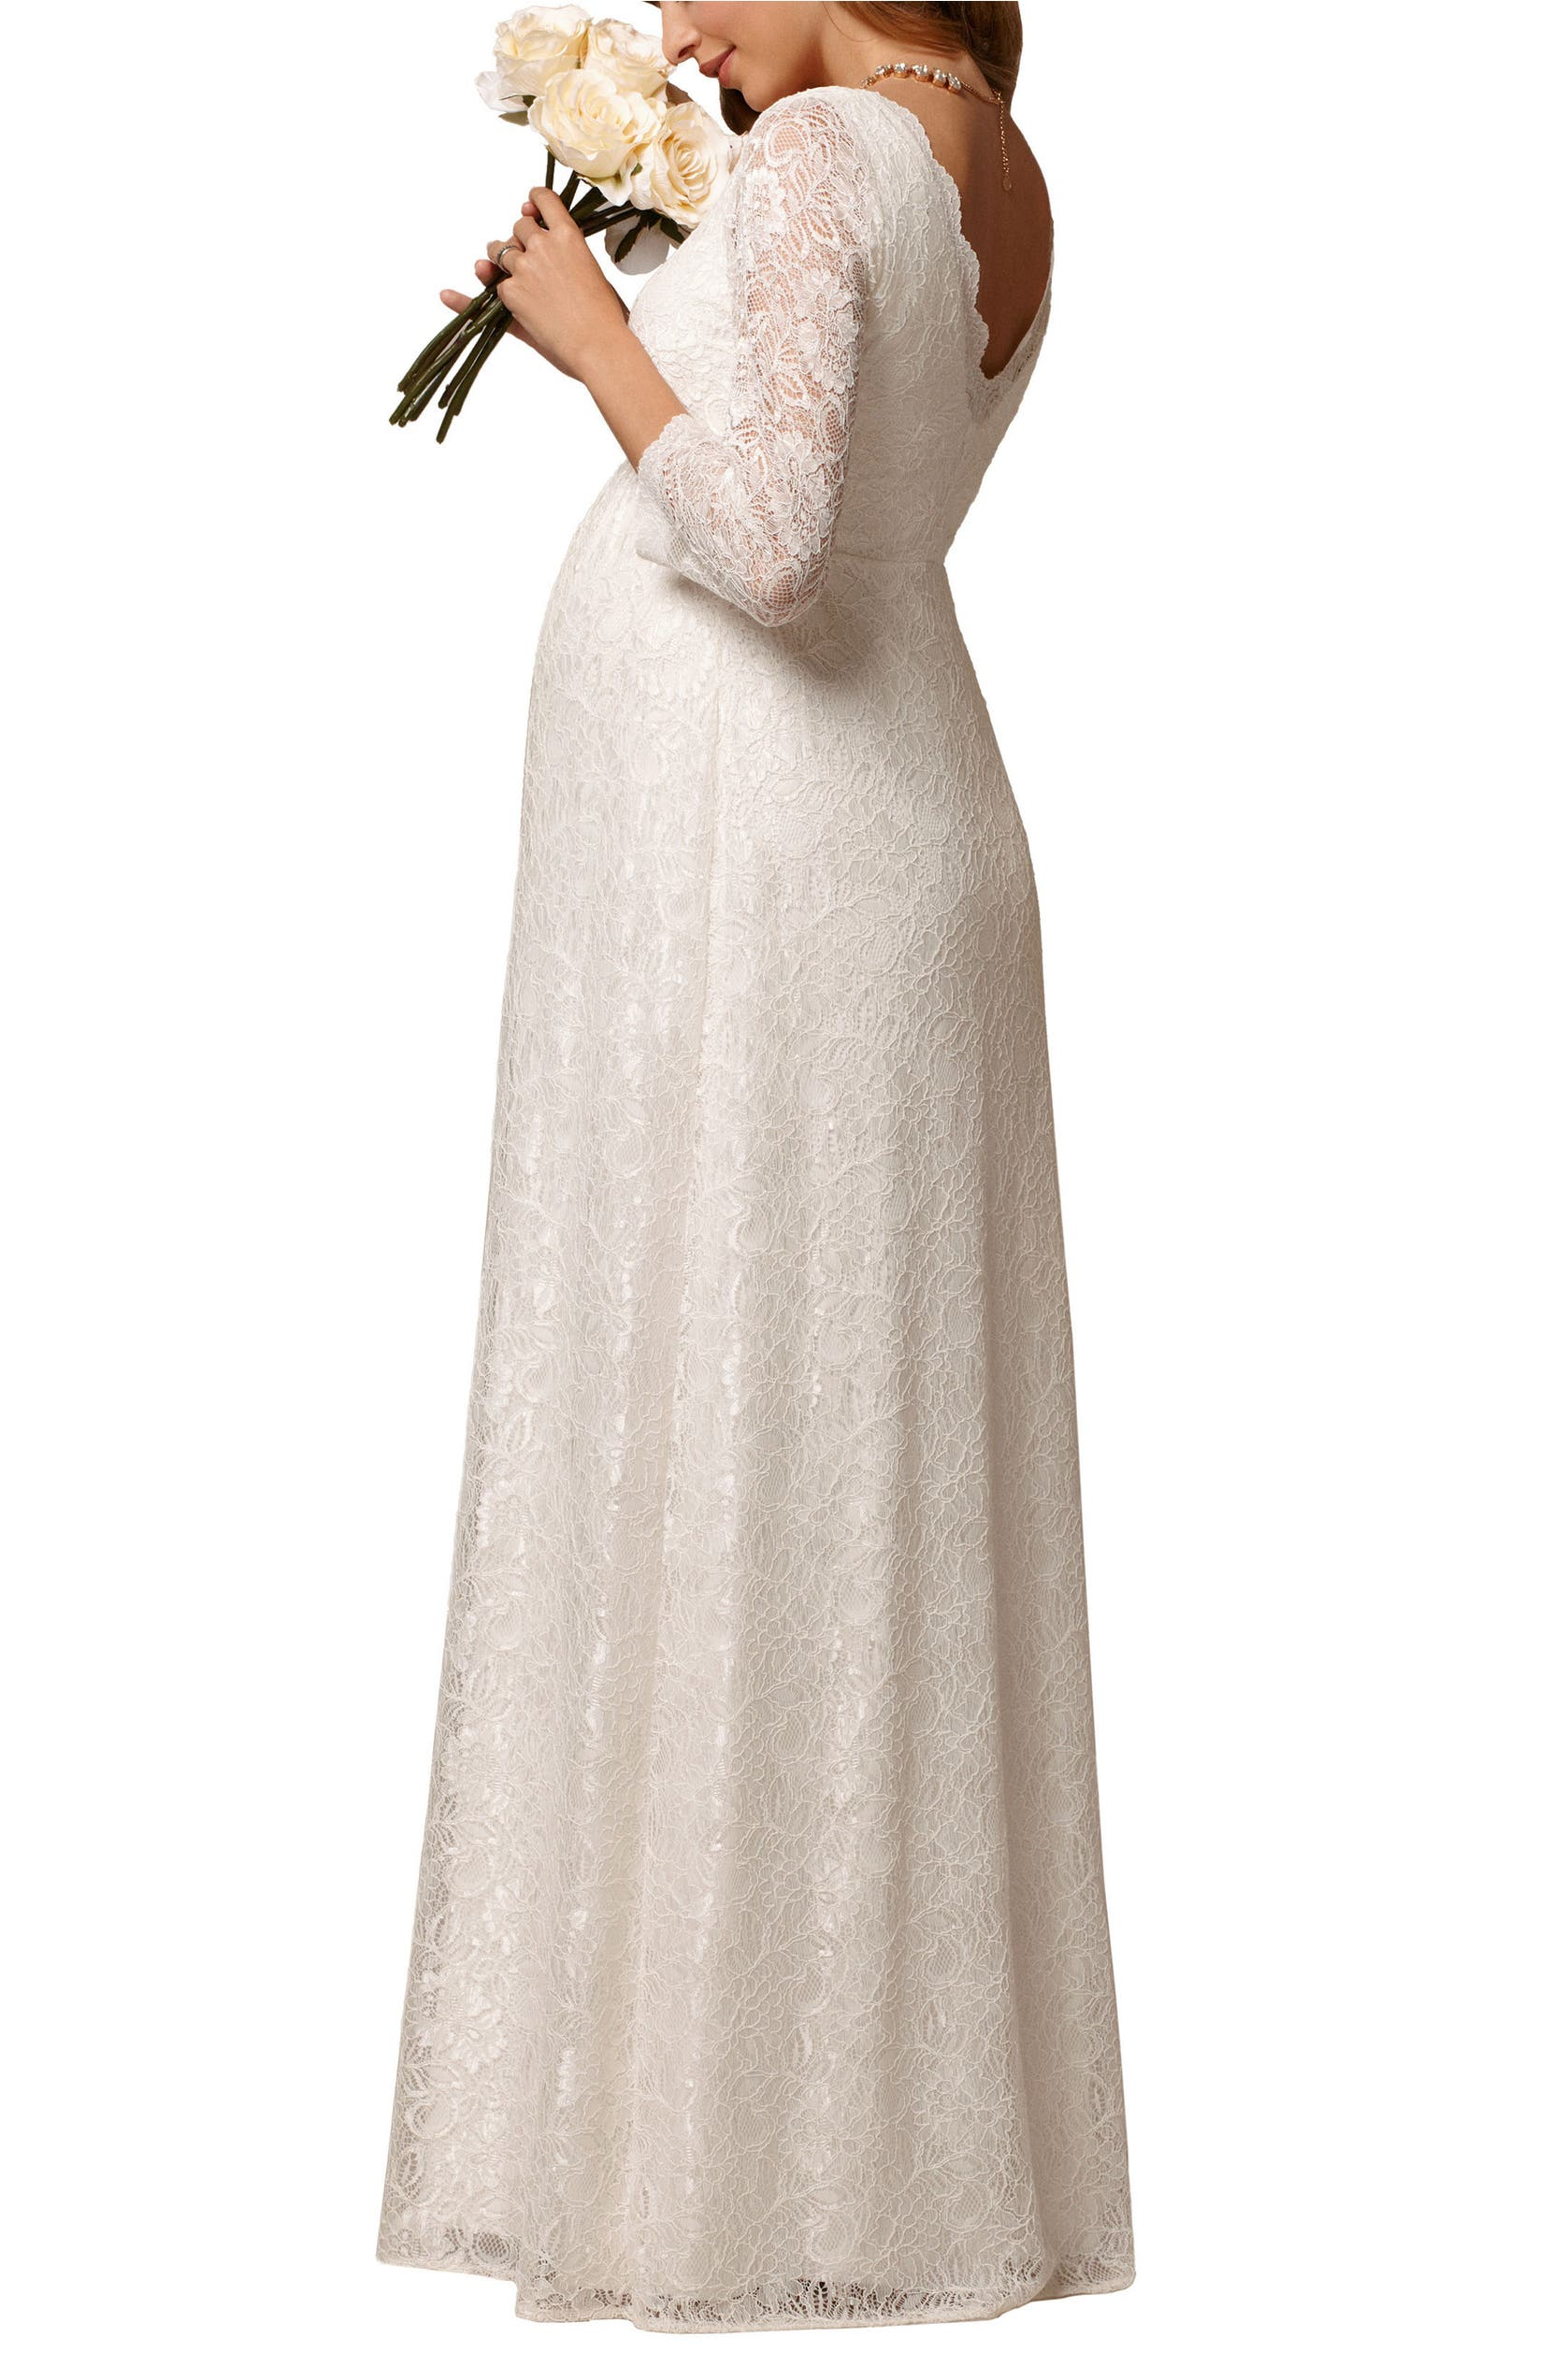 dd32e0546f0e Tiffany Rose Chloe Lace Maternity Gown | Nordstrom